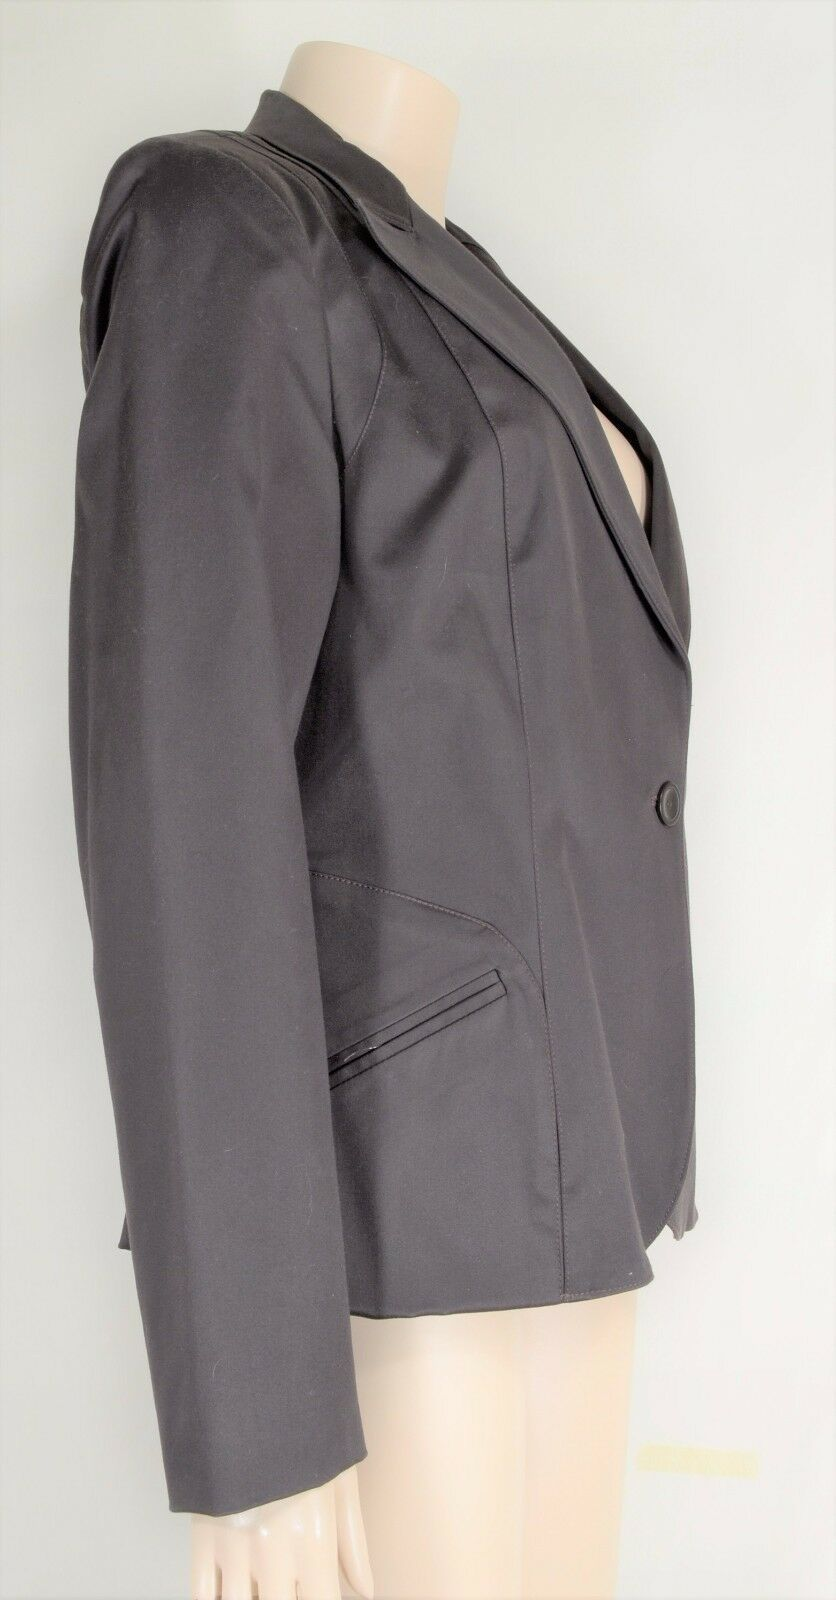 womyn jacket coat NWT SZ 8 dark brown 1-button closure lined NYC USA new image 8